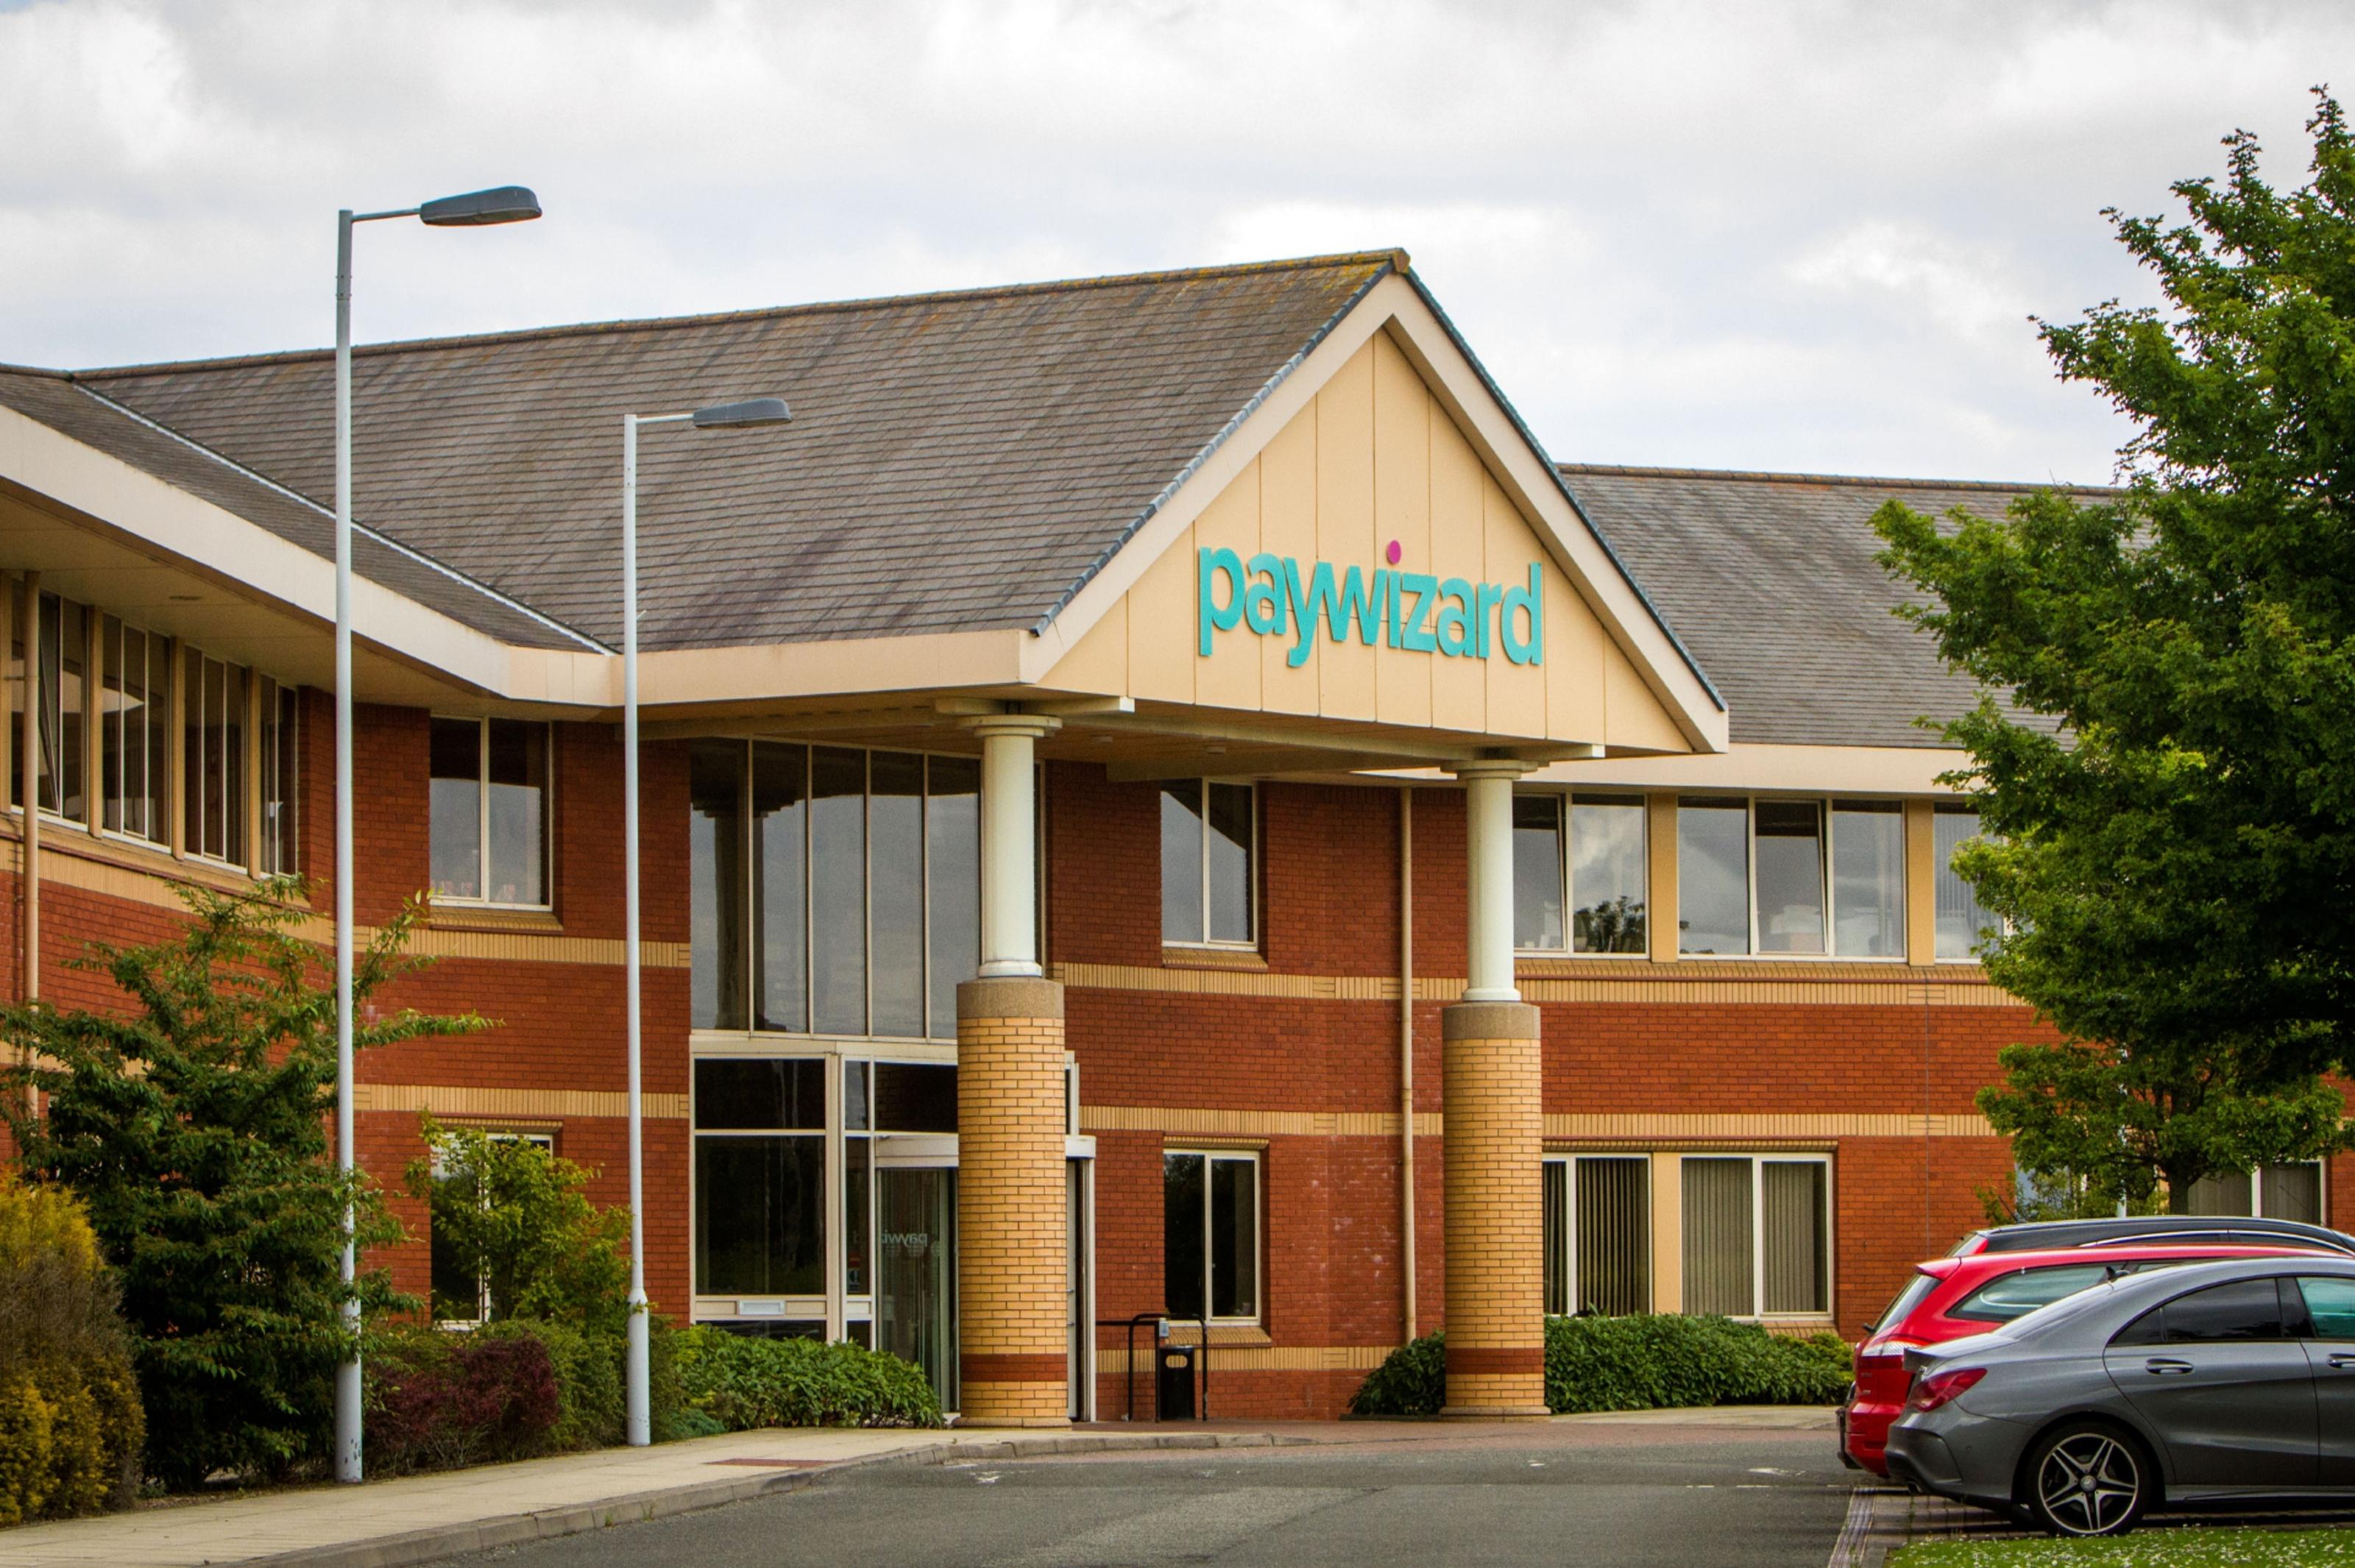 The Paywizard headquarters at John Smith Business Park, Kirkcaldy.